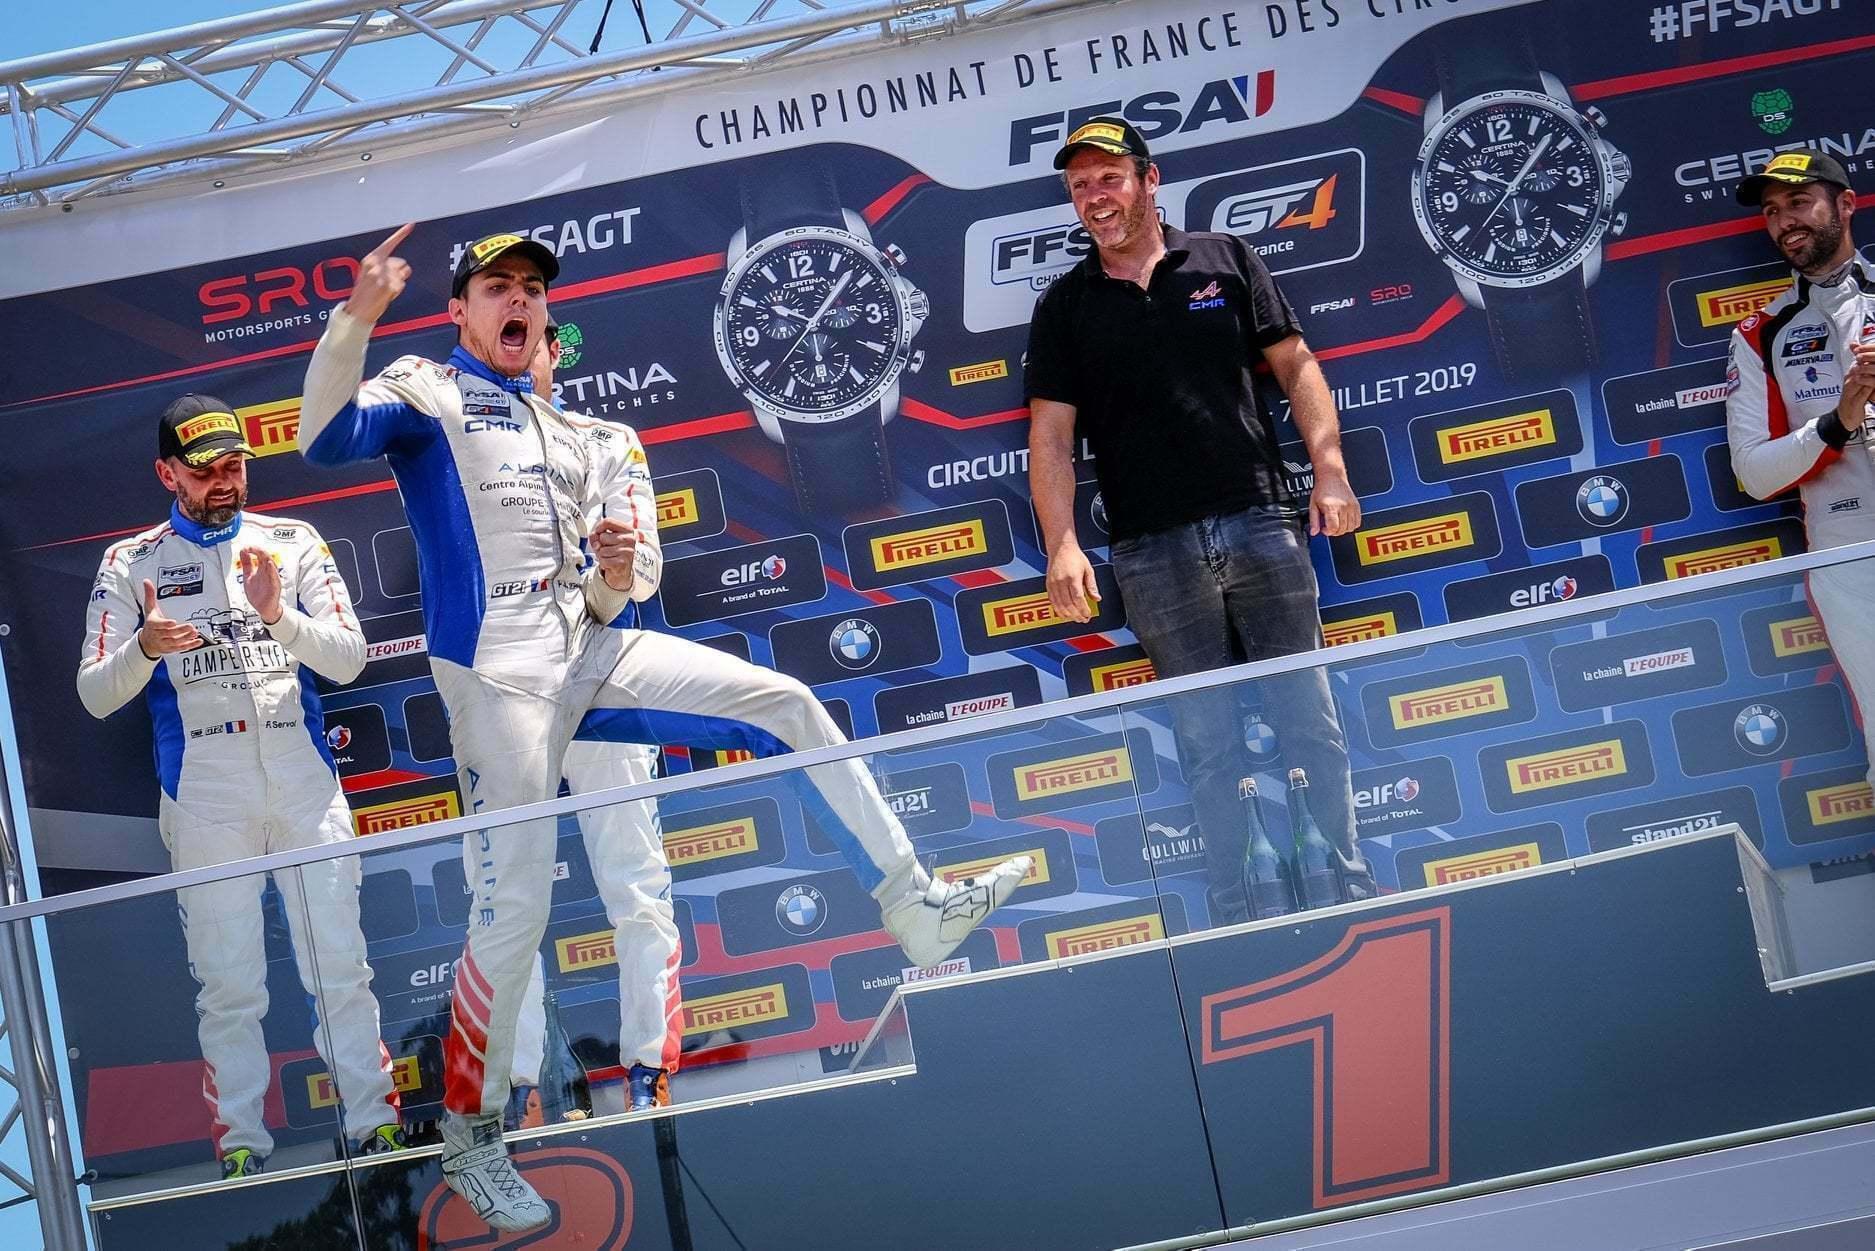 FFSA GT: CMR reprend la main Lédenon ! (Course 2) 22